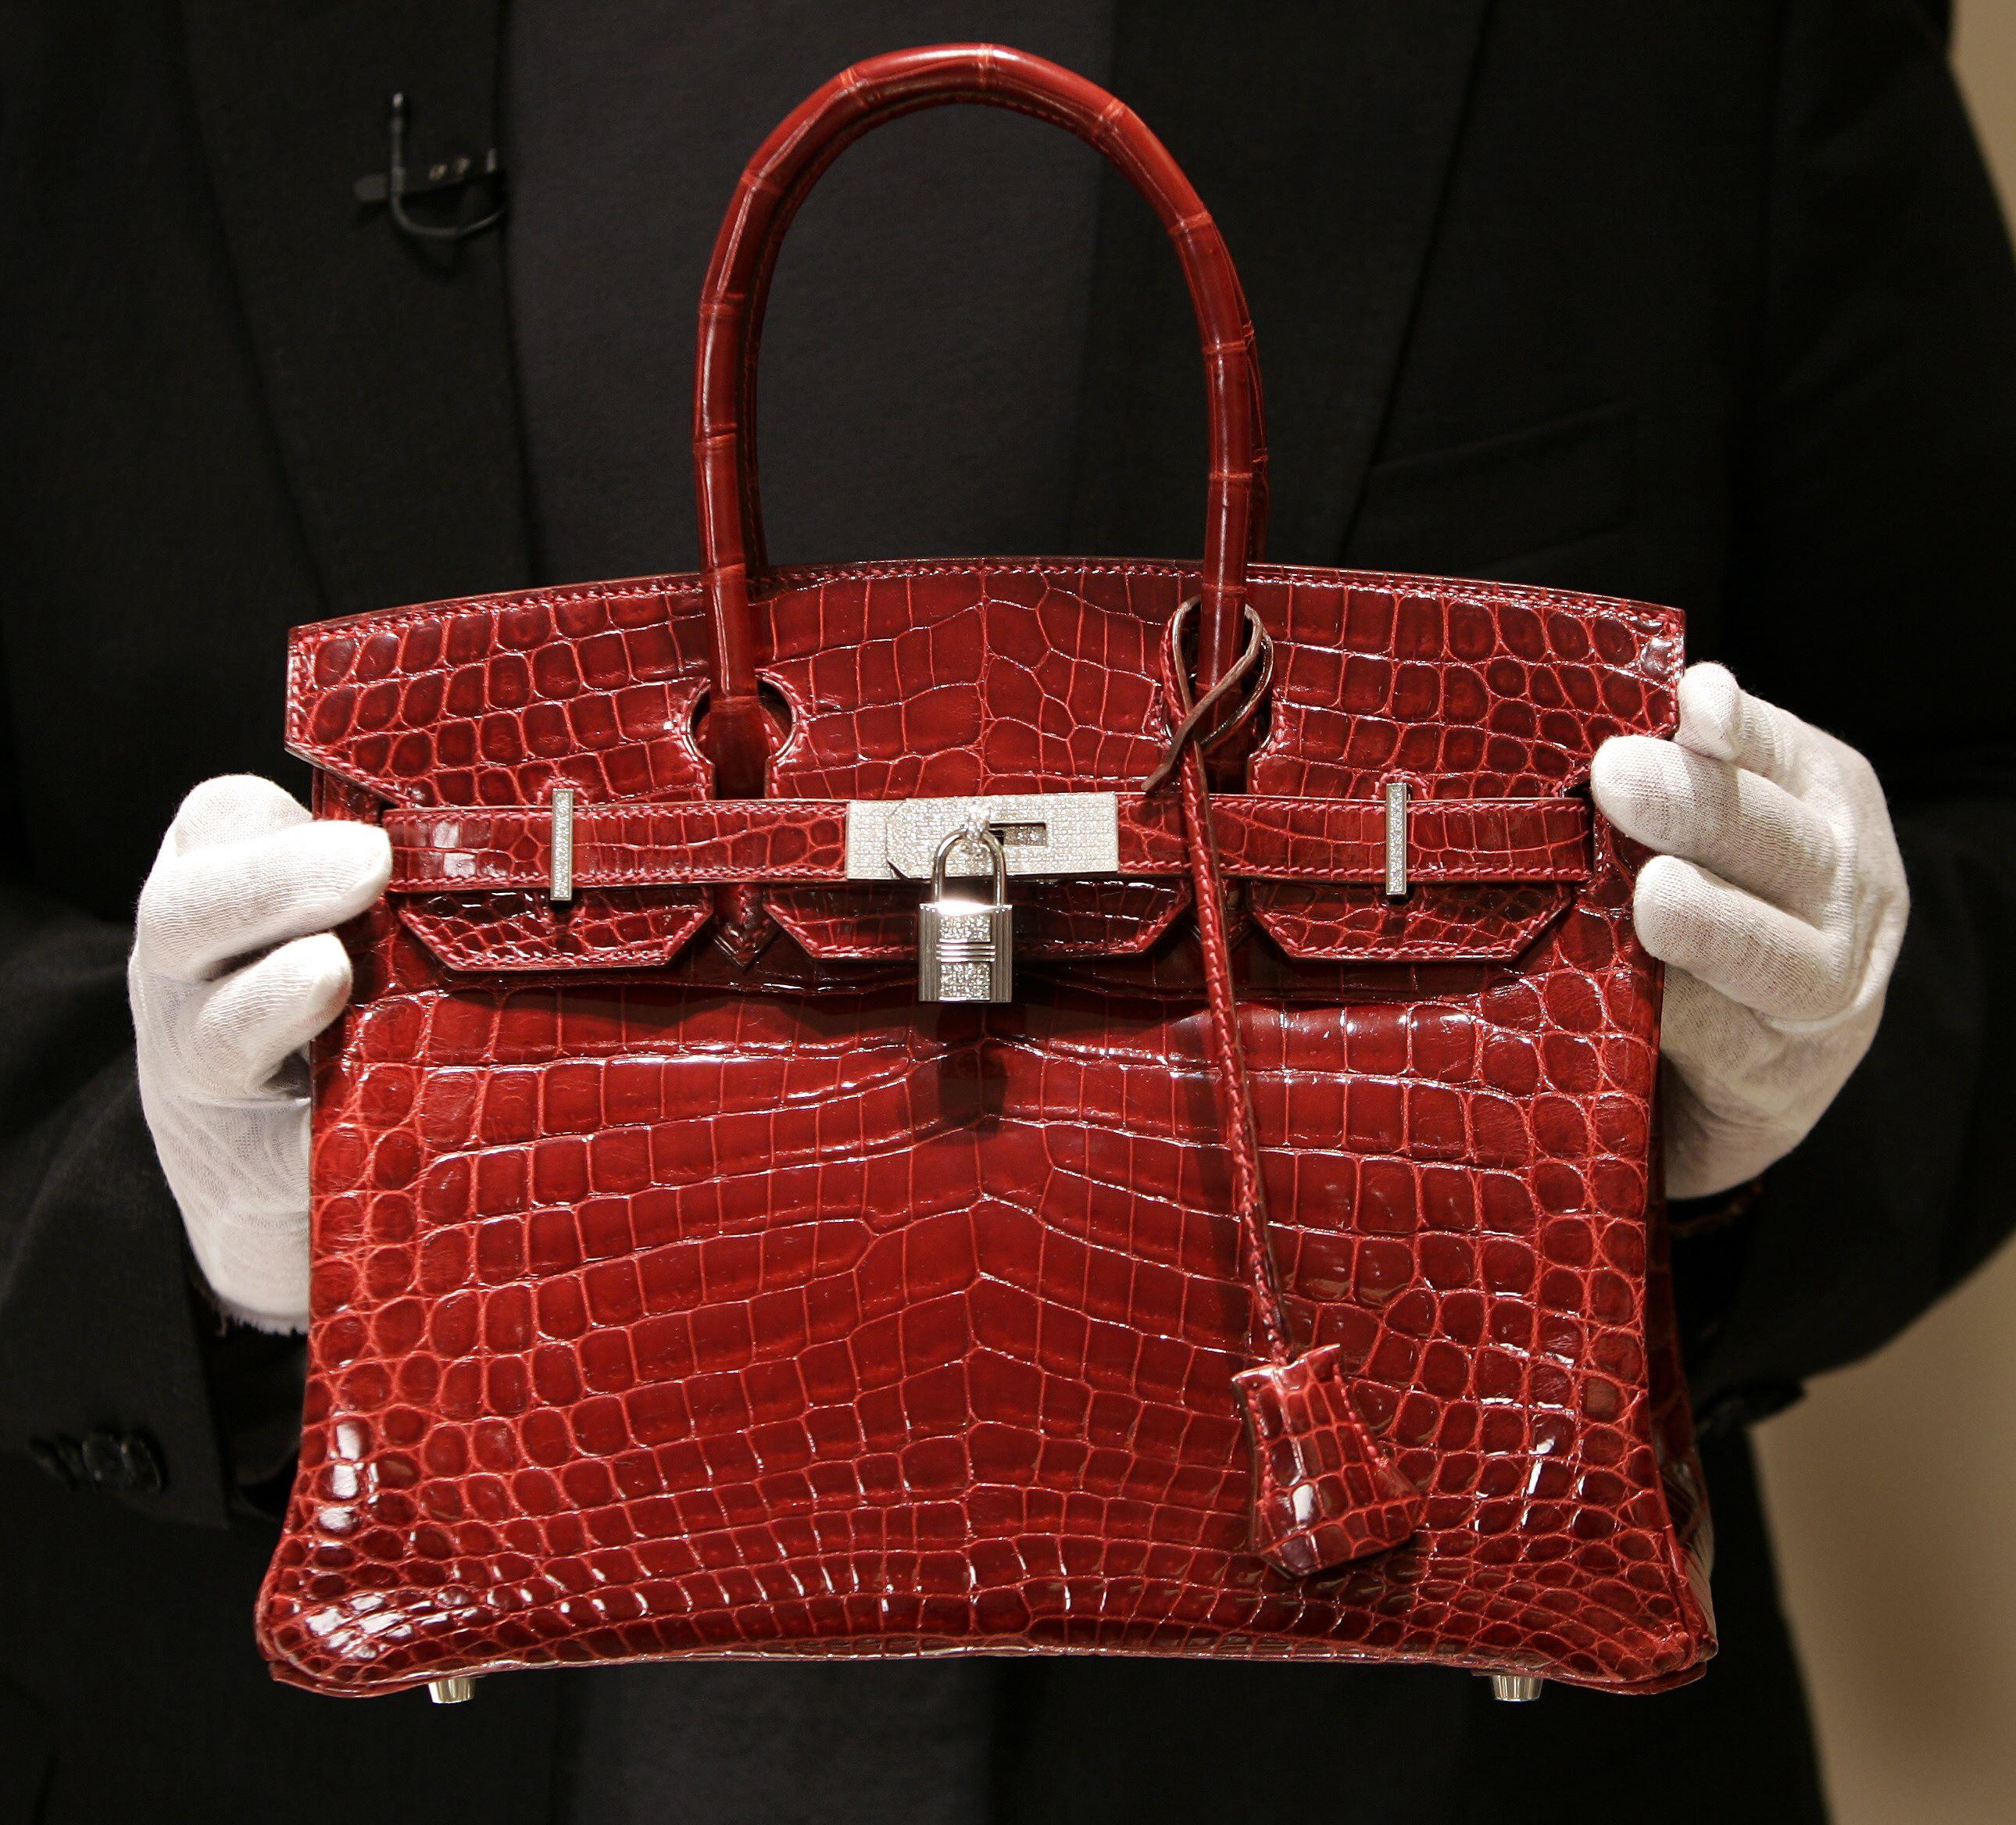 2349fd96f21 Fashion victims  Jane Birkin asks Hermes to change  her  handbag s name